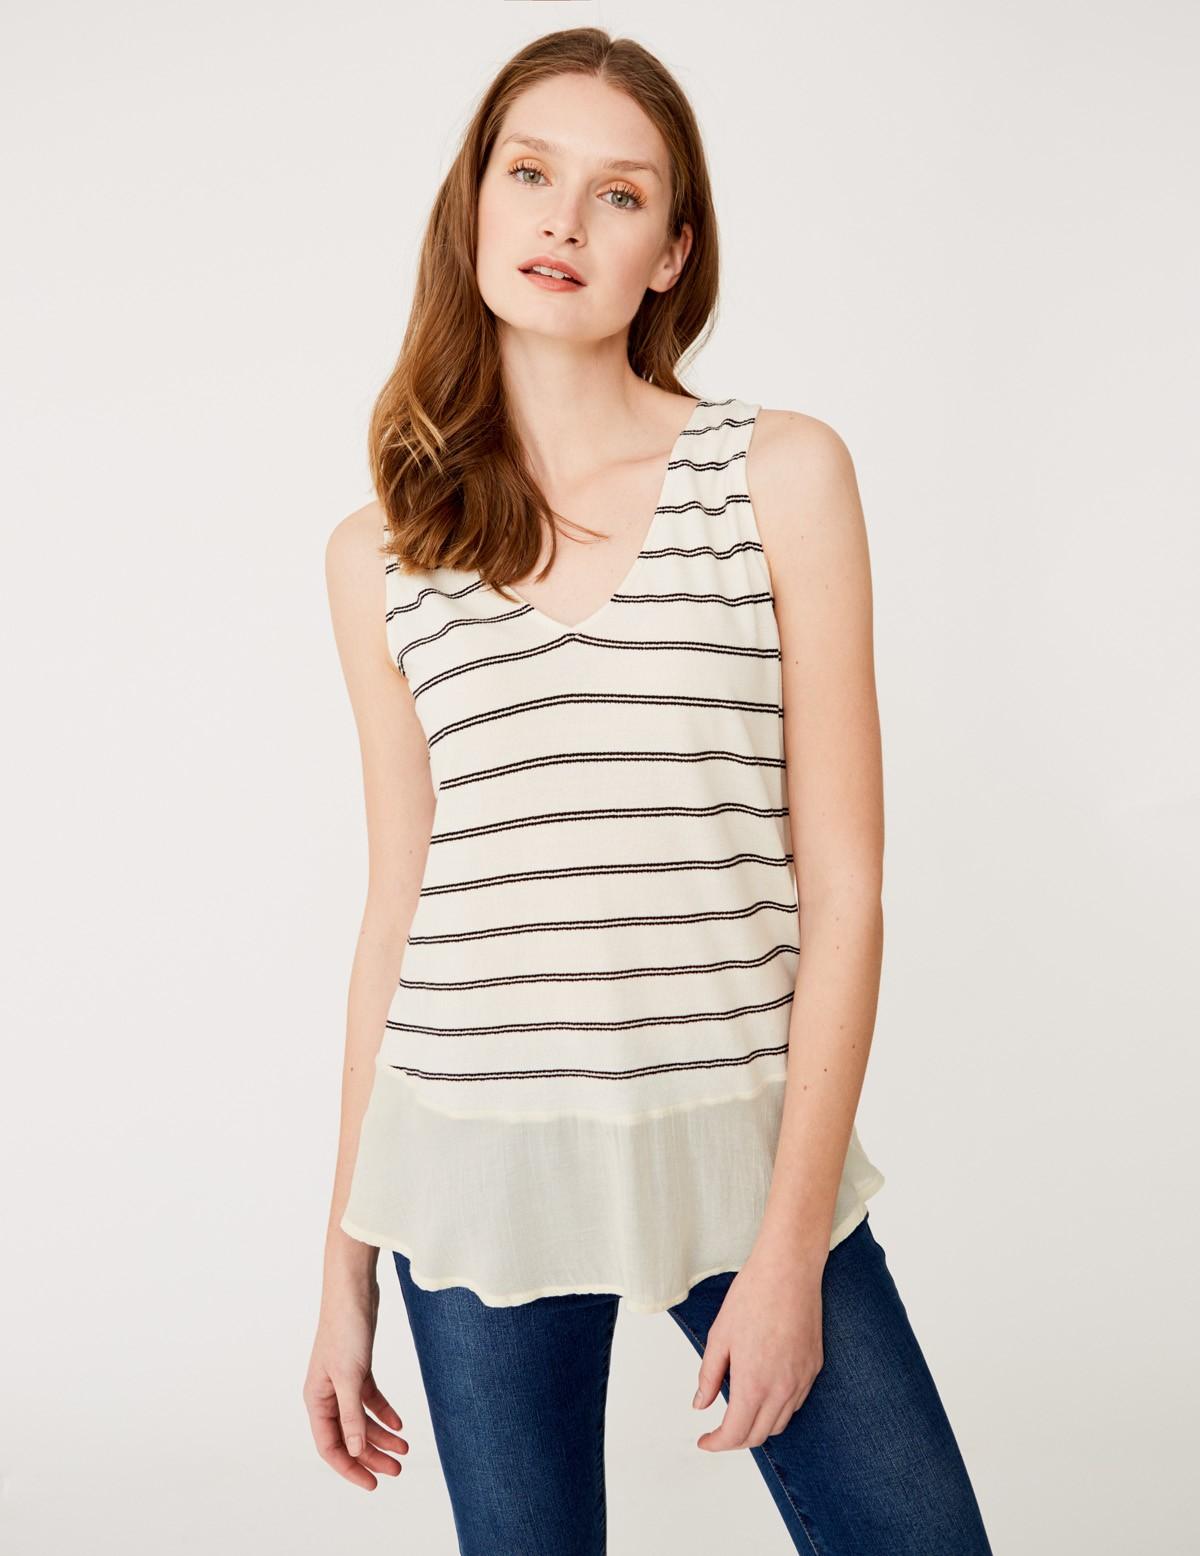 Camiseta sin mangas rayas